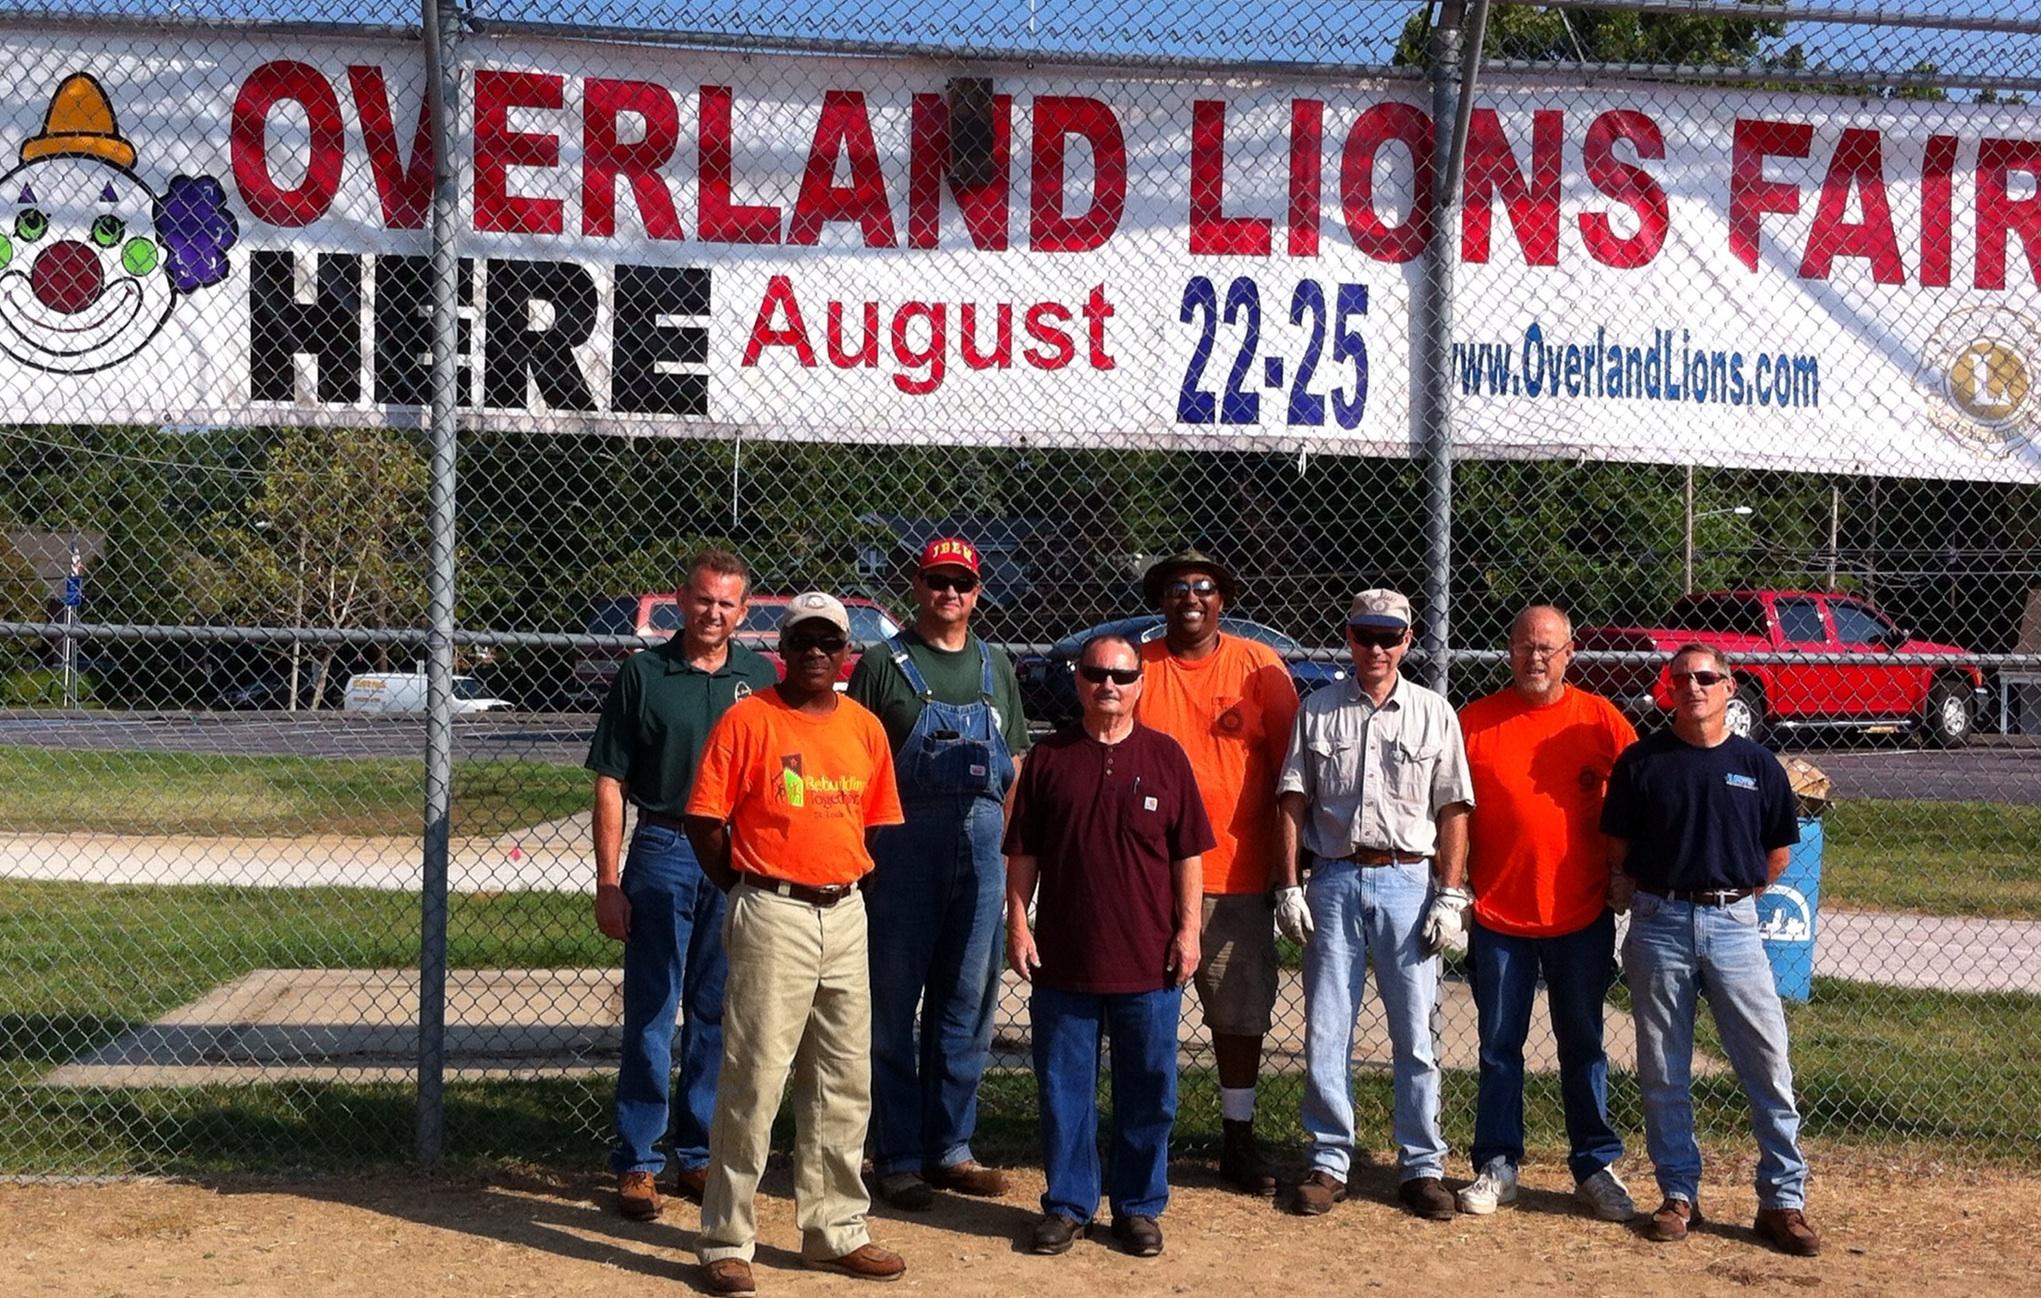 Overland Lions Fair